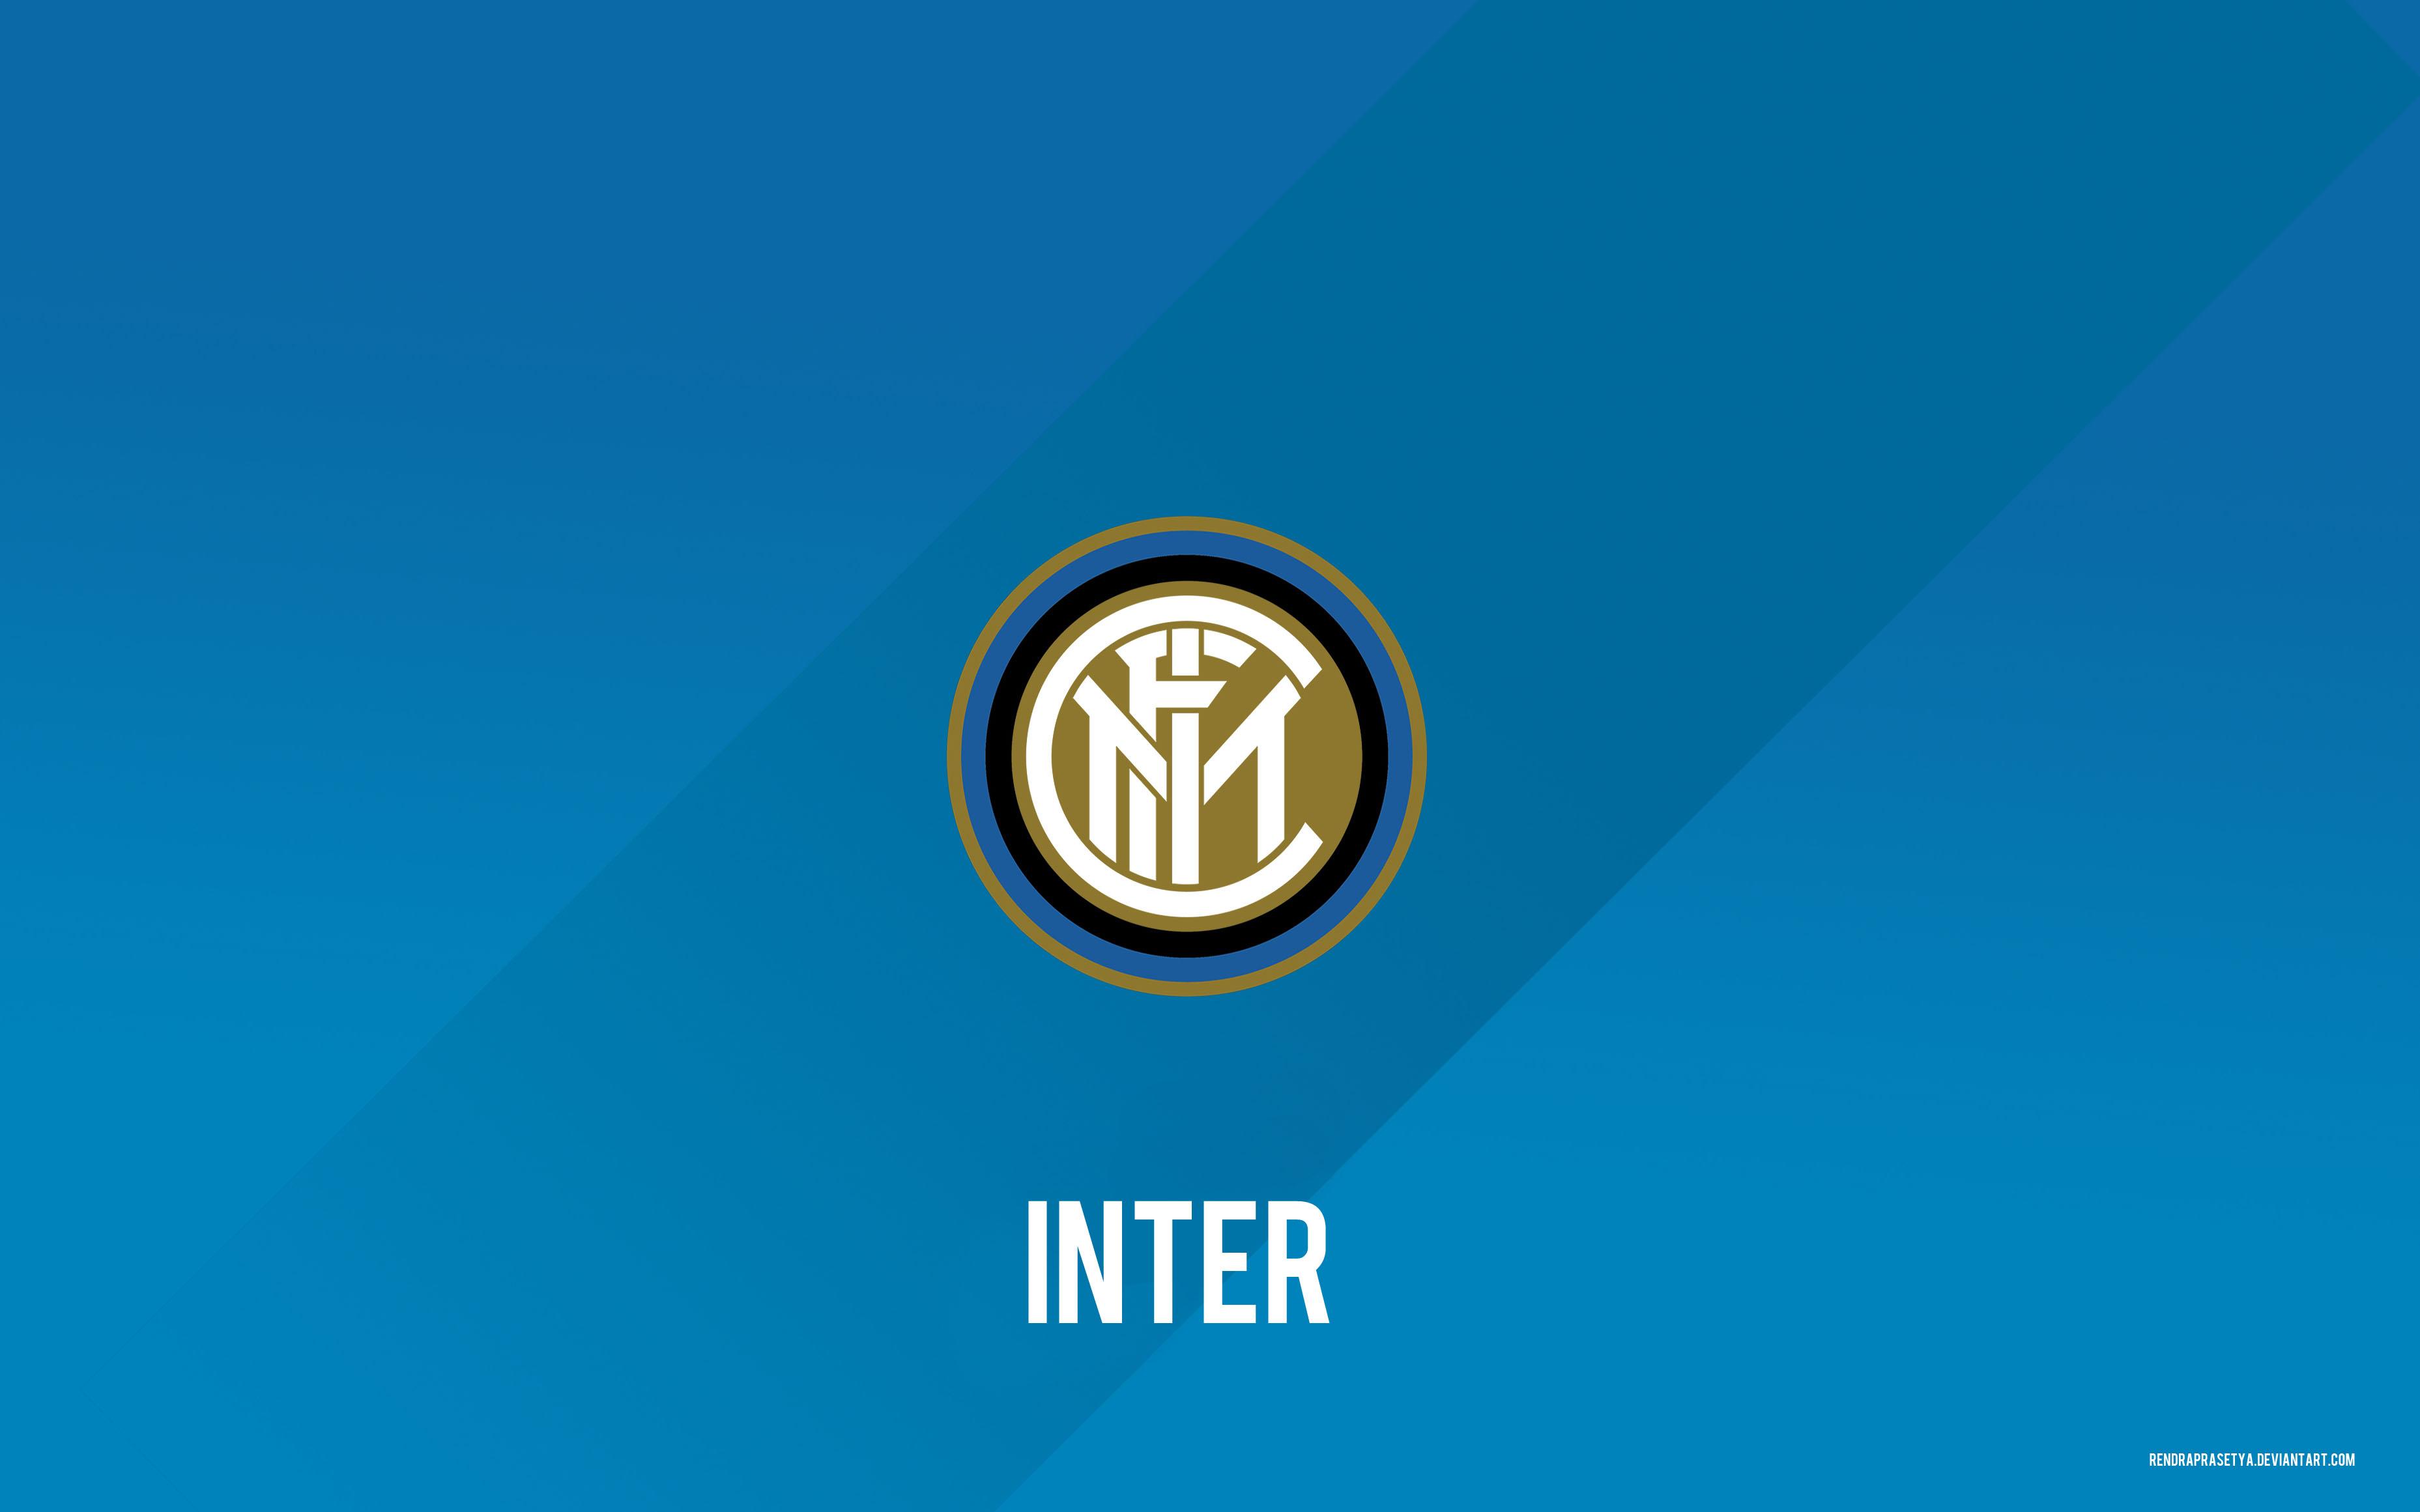 1920x1080 inter milan football club logo laptop full hd for Sfondi milan hd